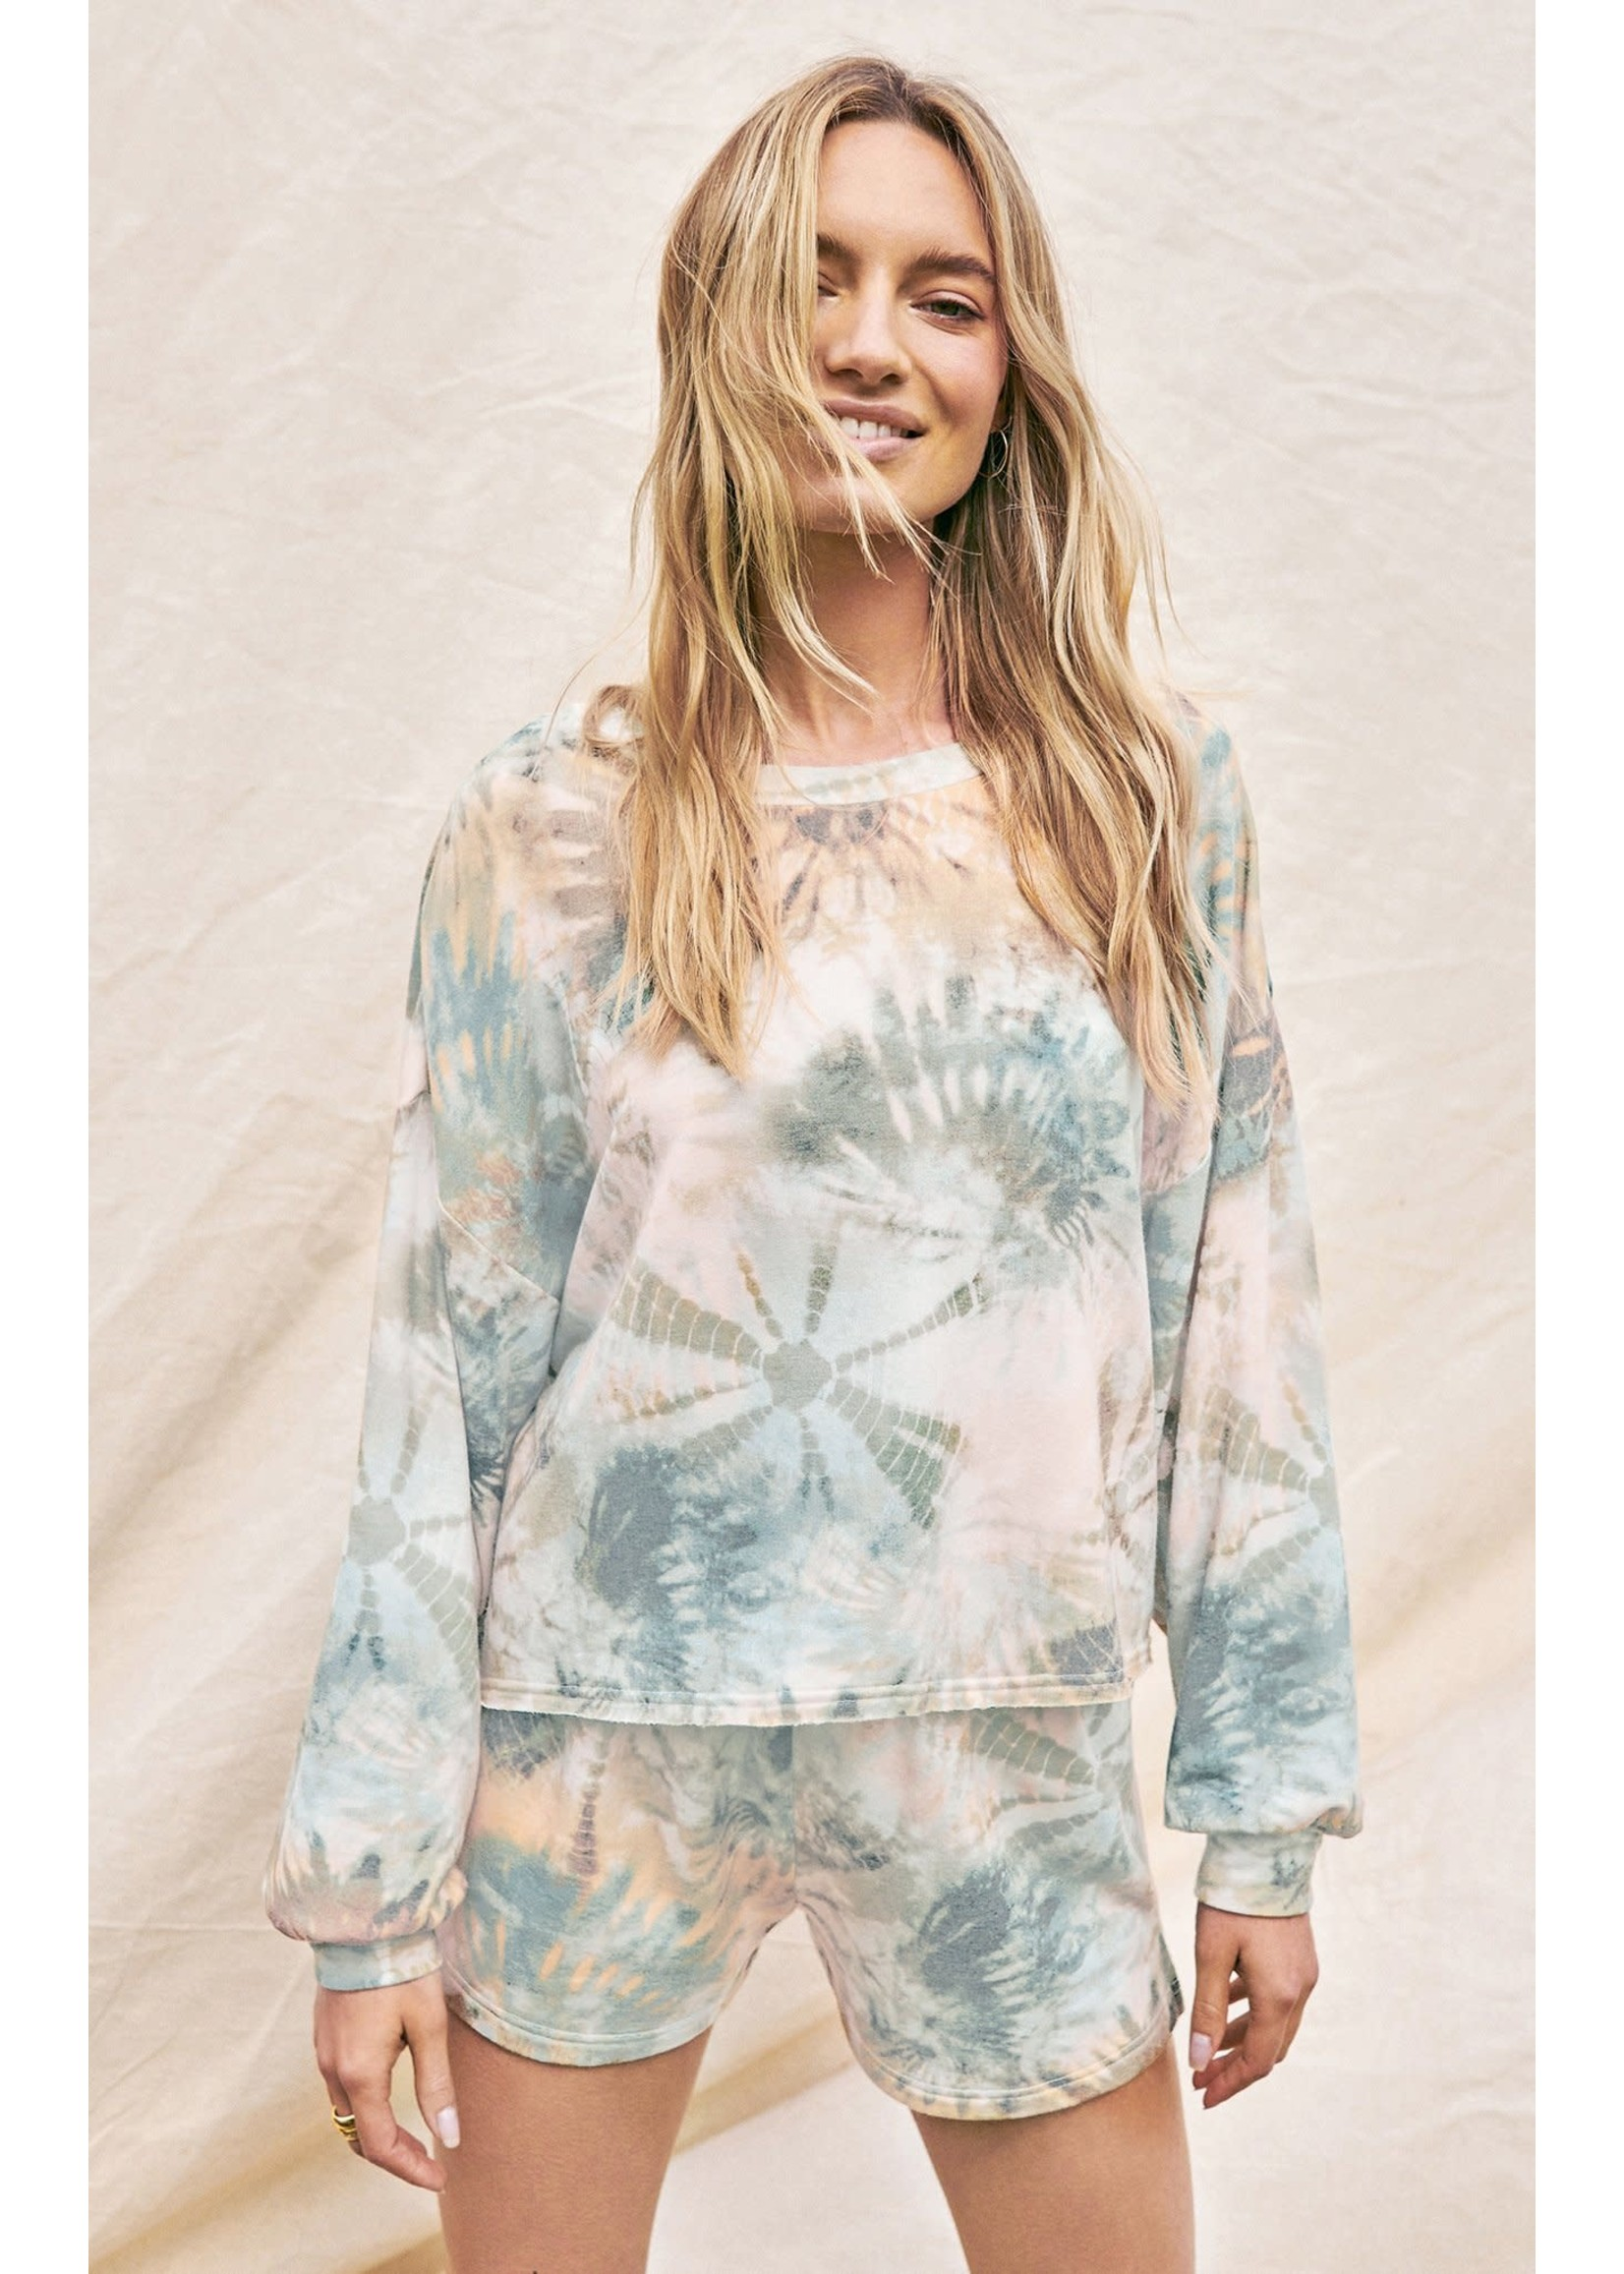 Z Supply Aqua Sweatshirt